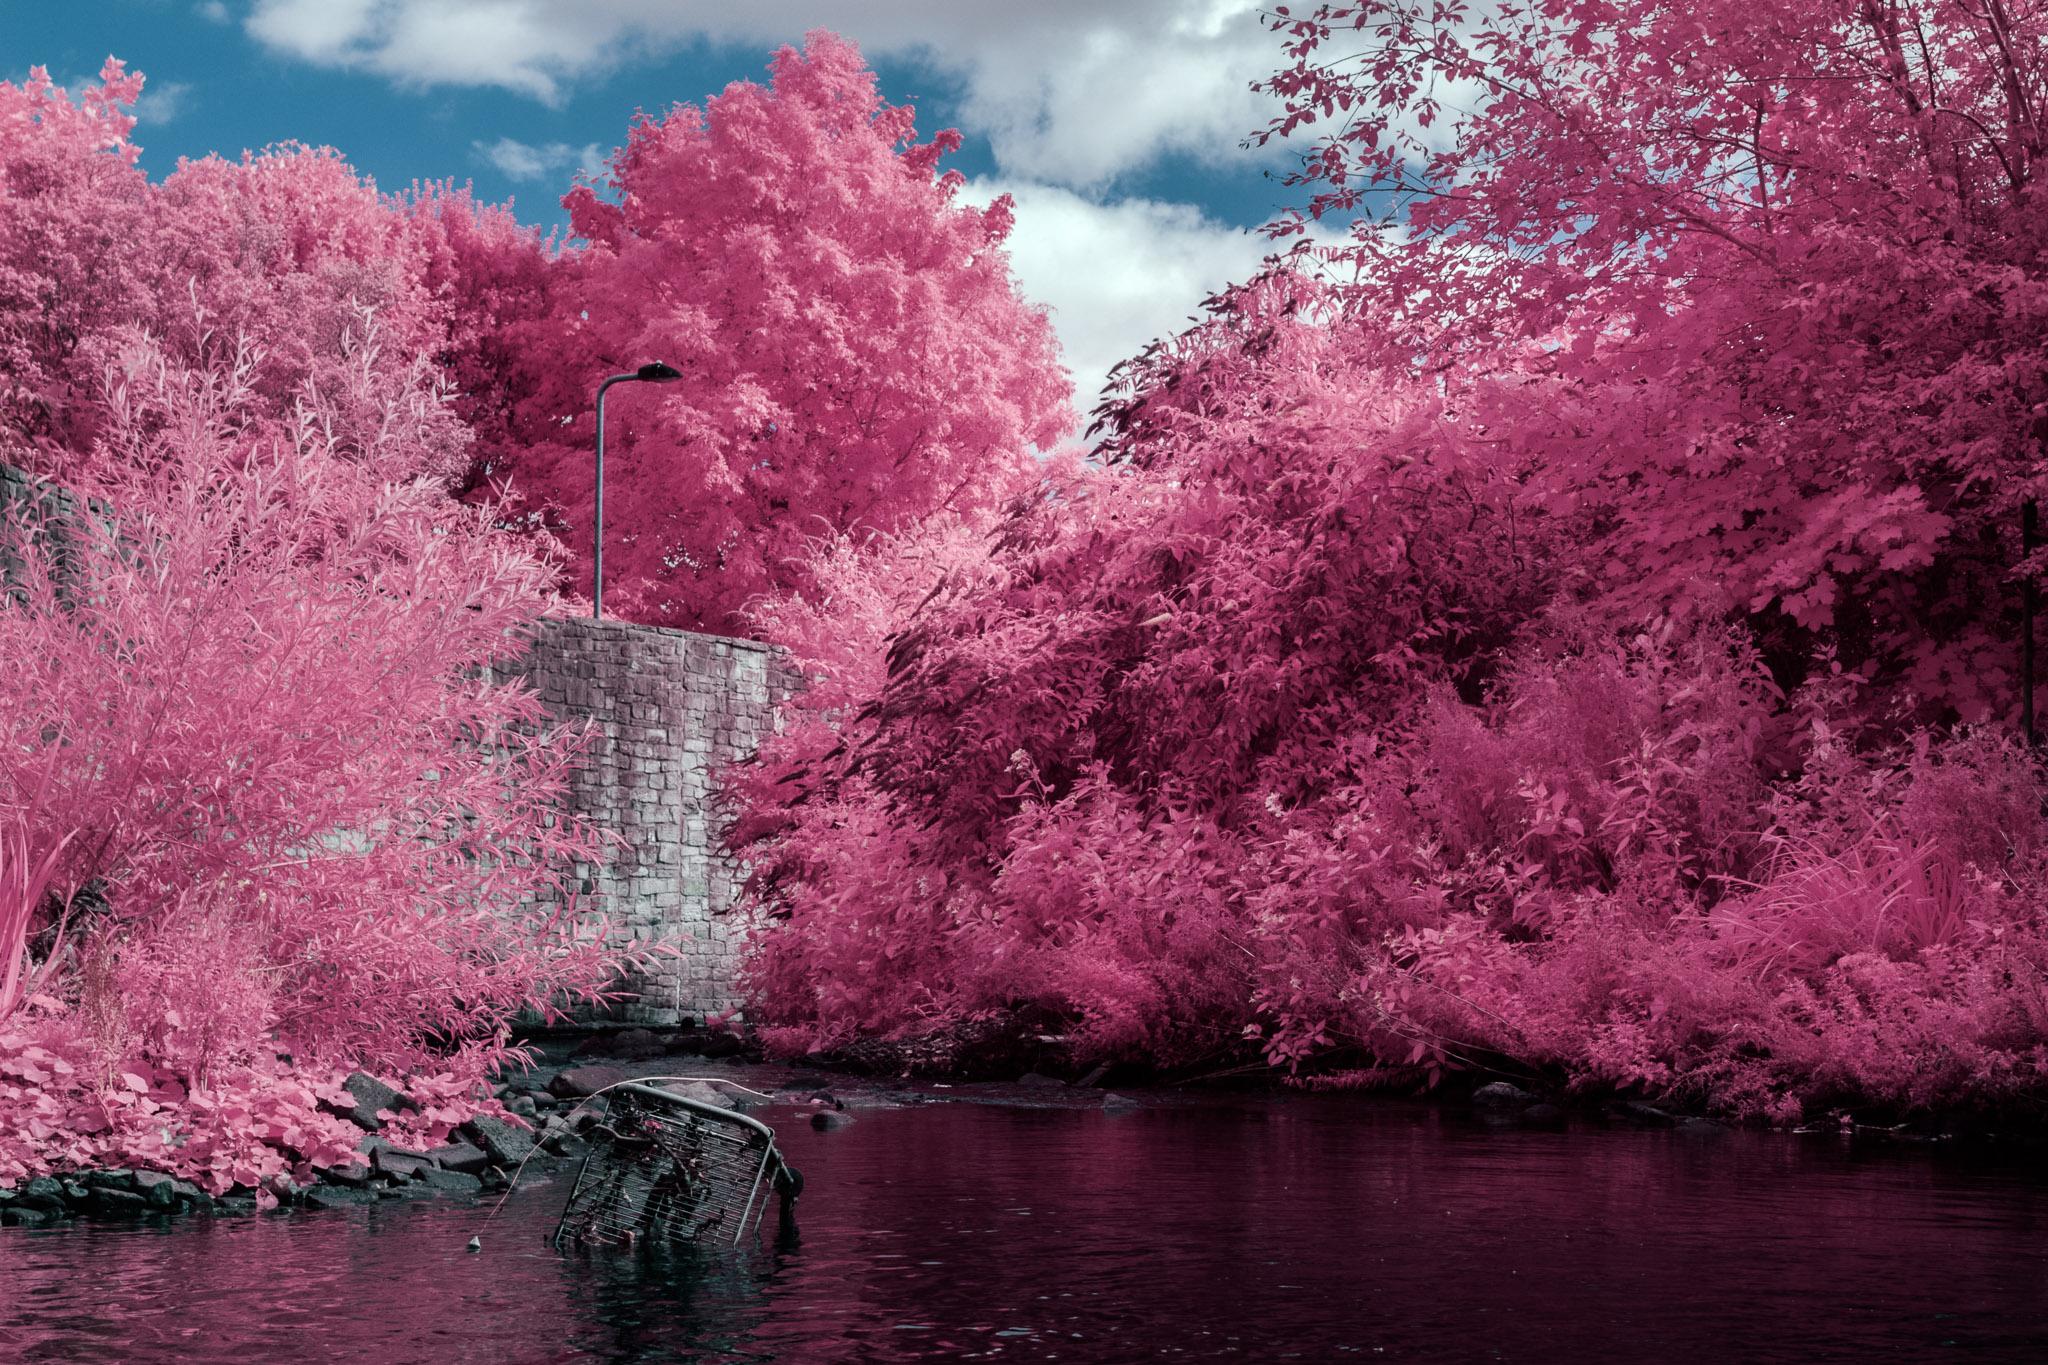 Kodak EIR Colour Infrared, Edgelands, Wasteland, Out of sight, Trolley, River ©Jonny Sutton